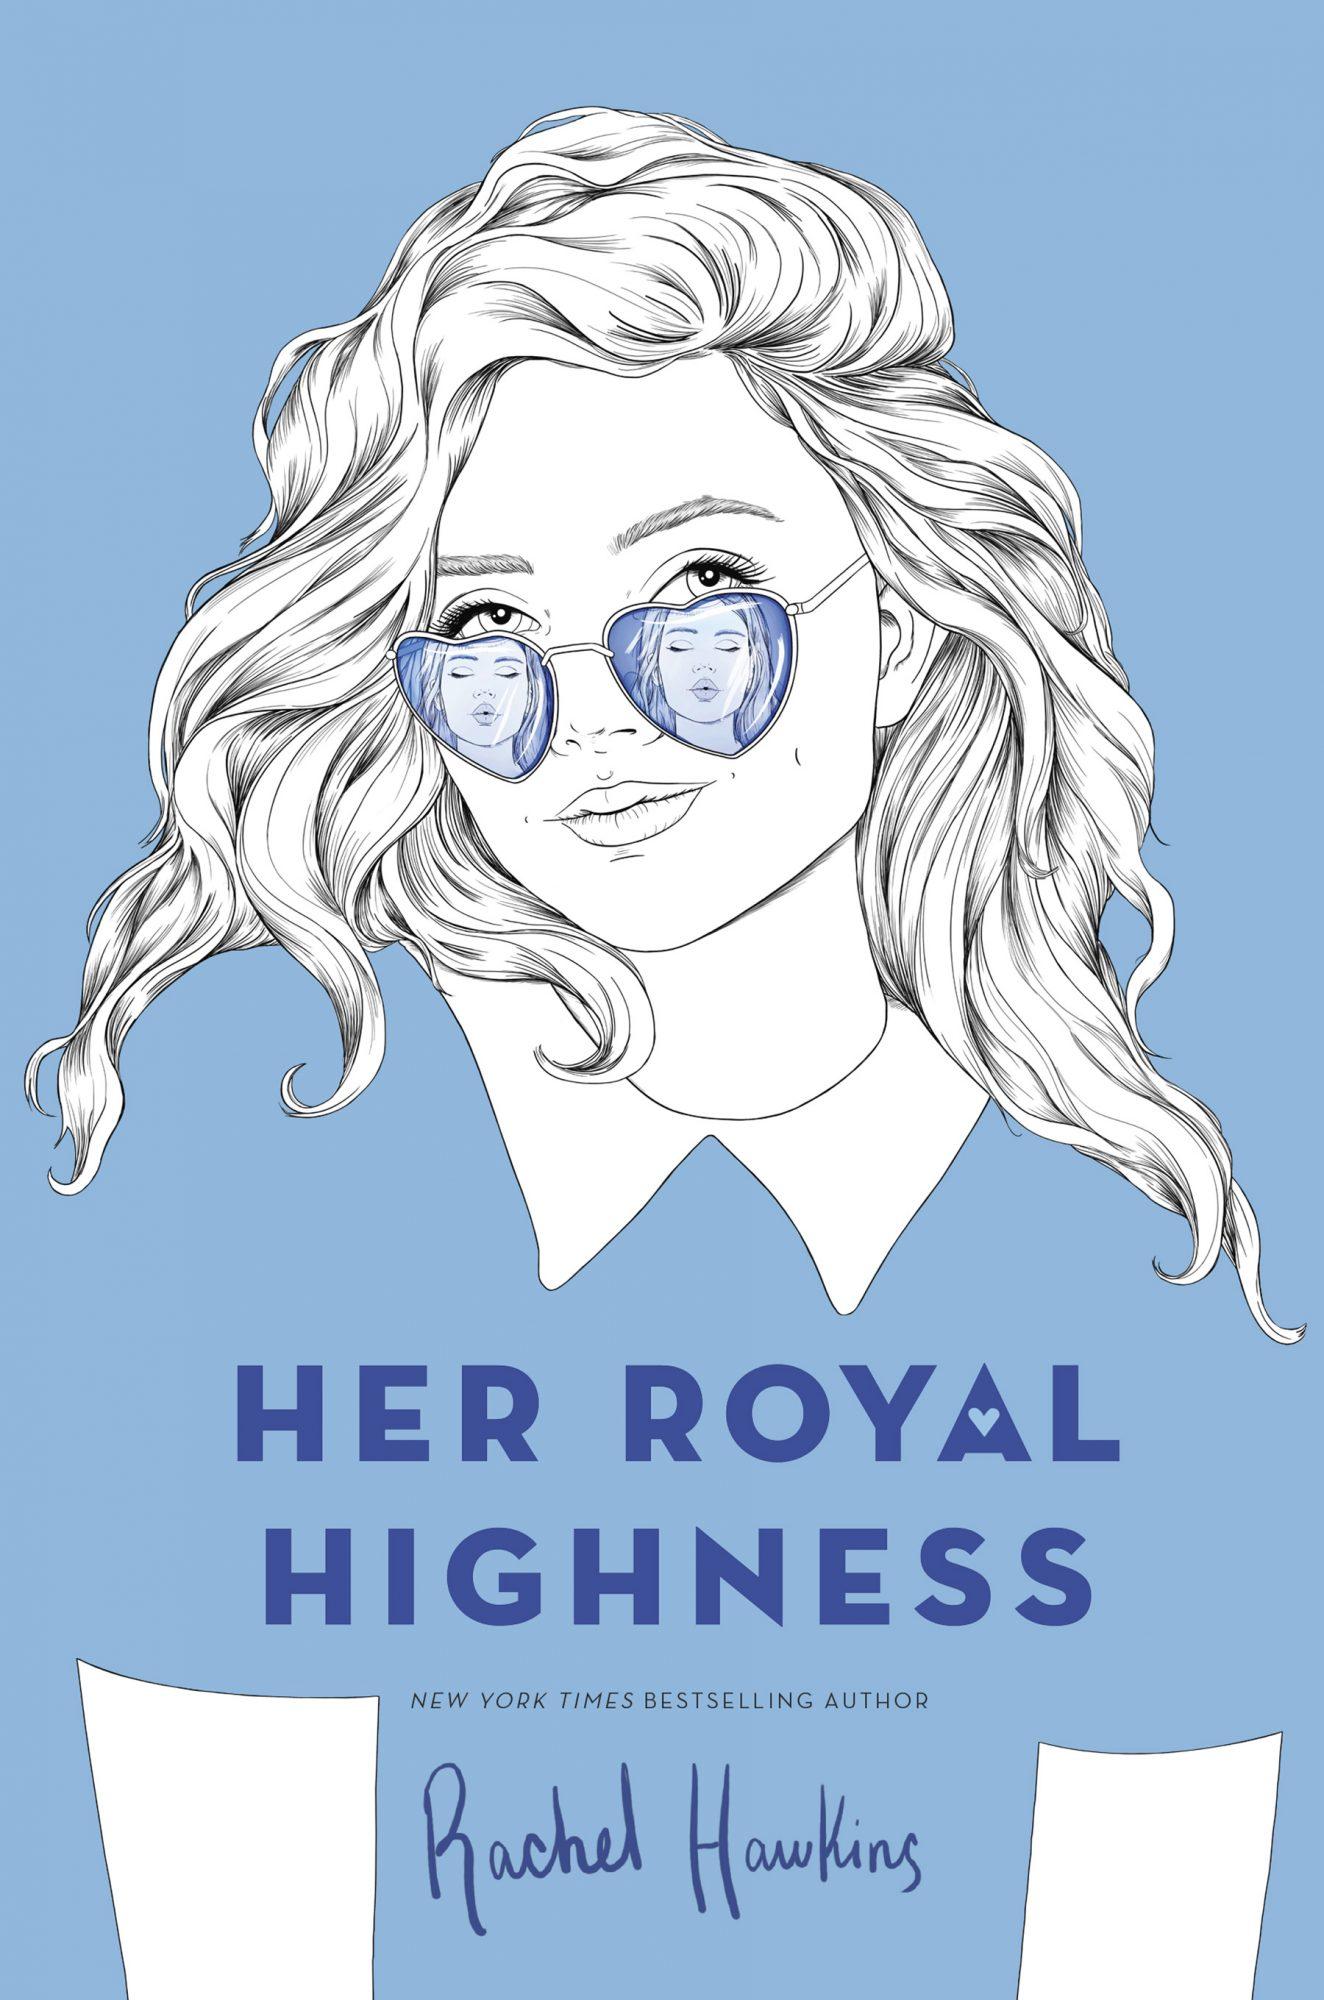 Her Royal Highness by Rachel Hawkins